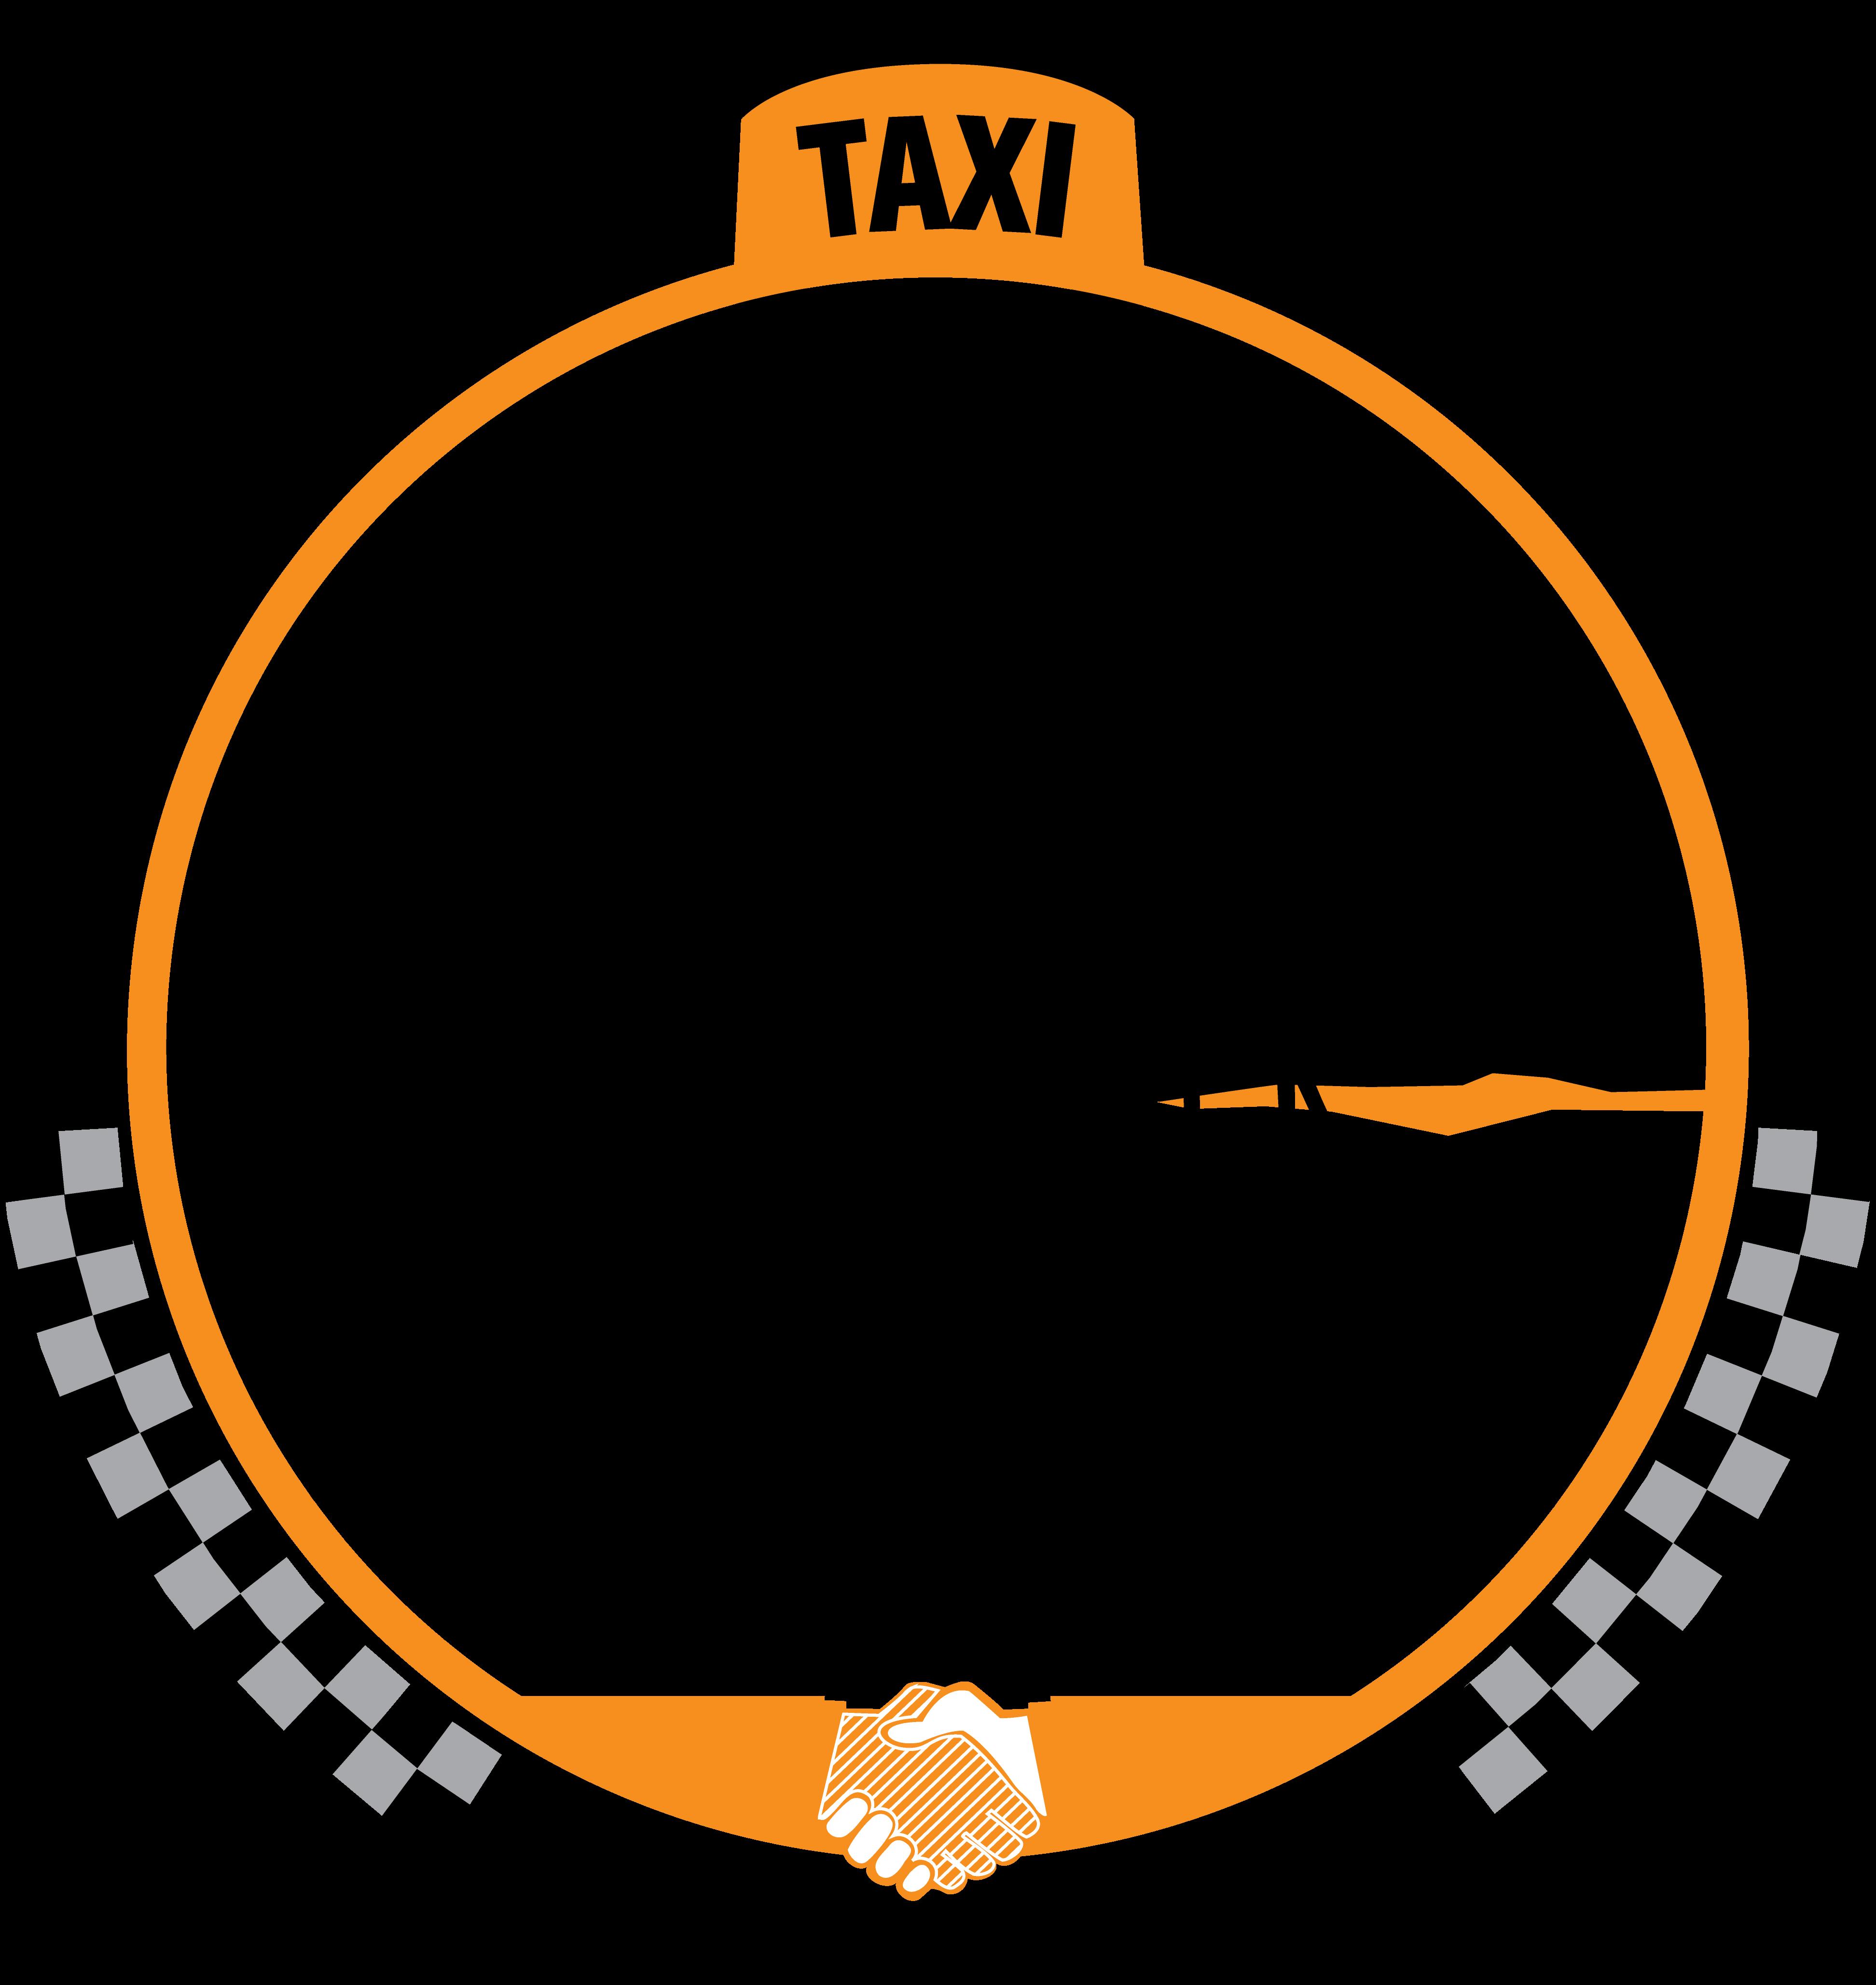 San Francisco Taxi Workers Alliance / AFL-CIO